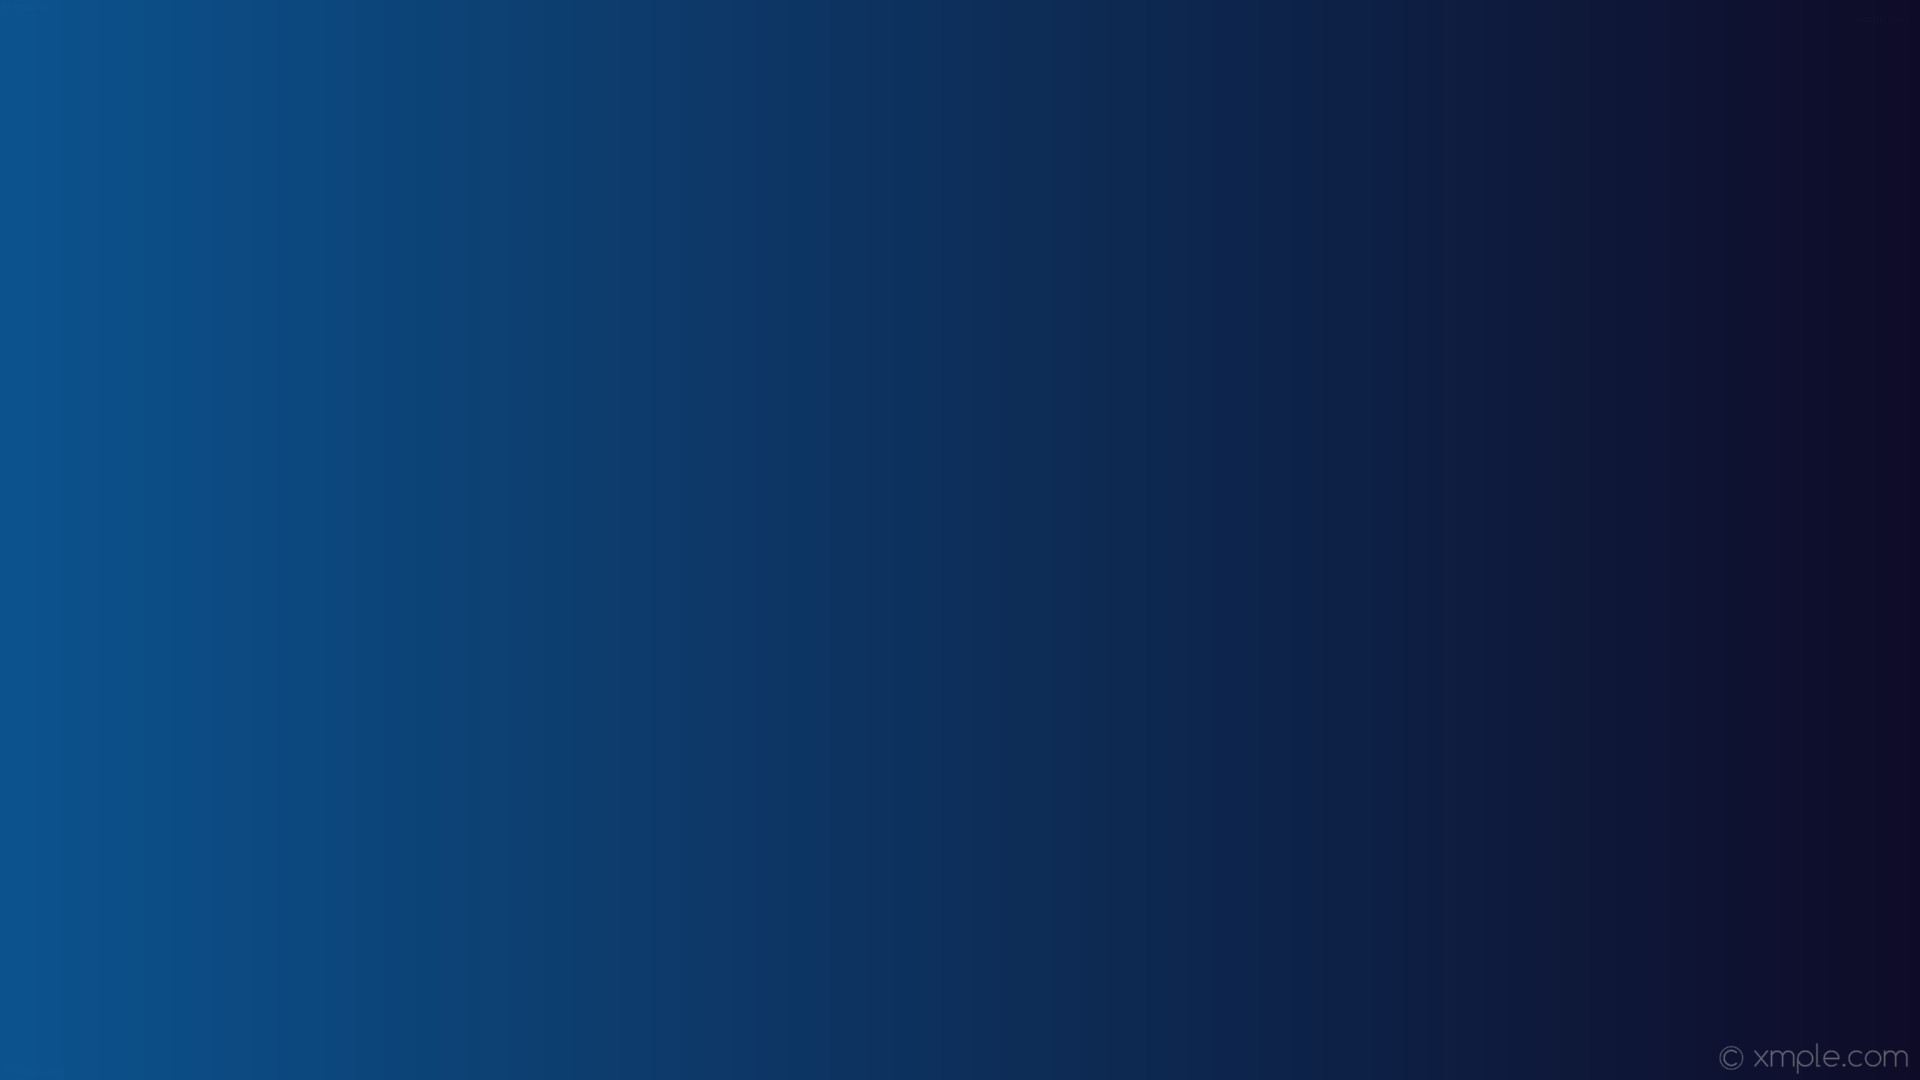 wallpaper linear azure blue gradient dark blue #0e0b27 #0c538e 0°